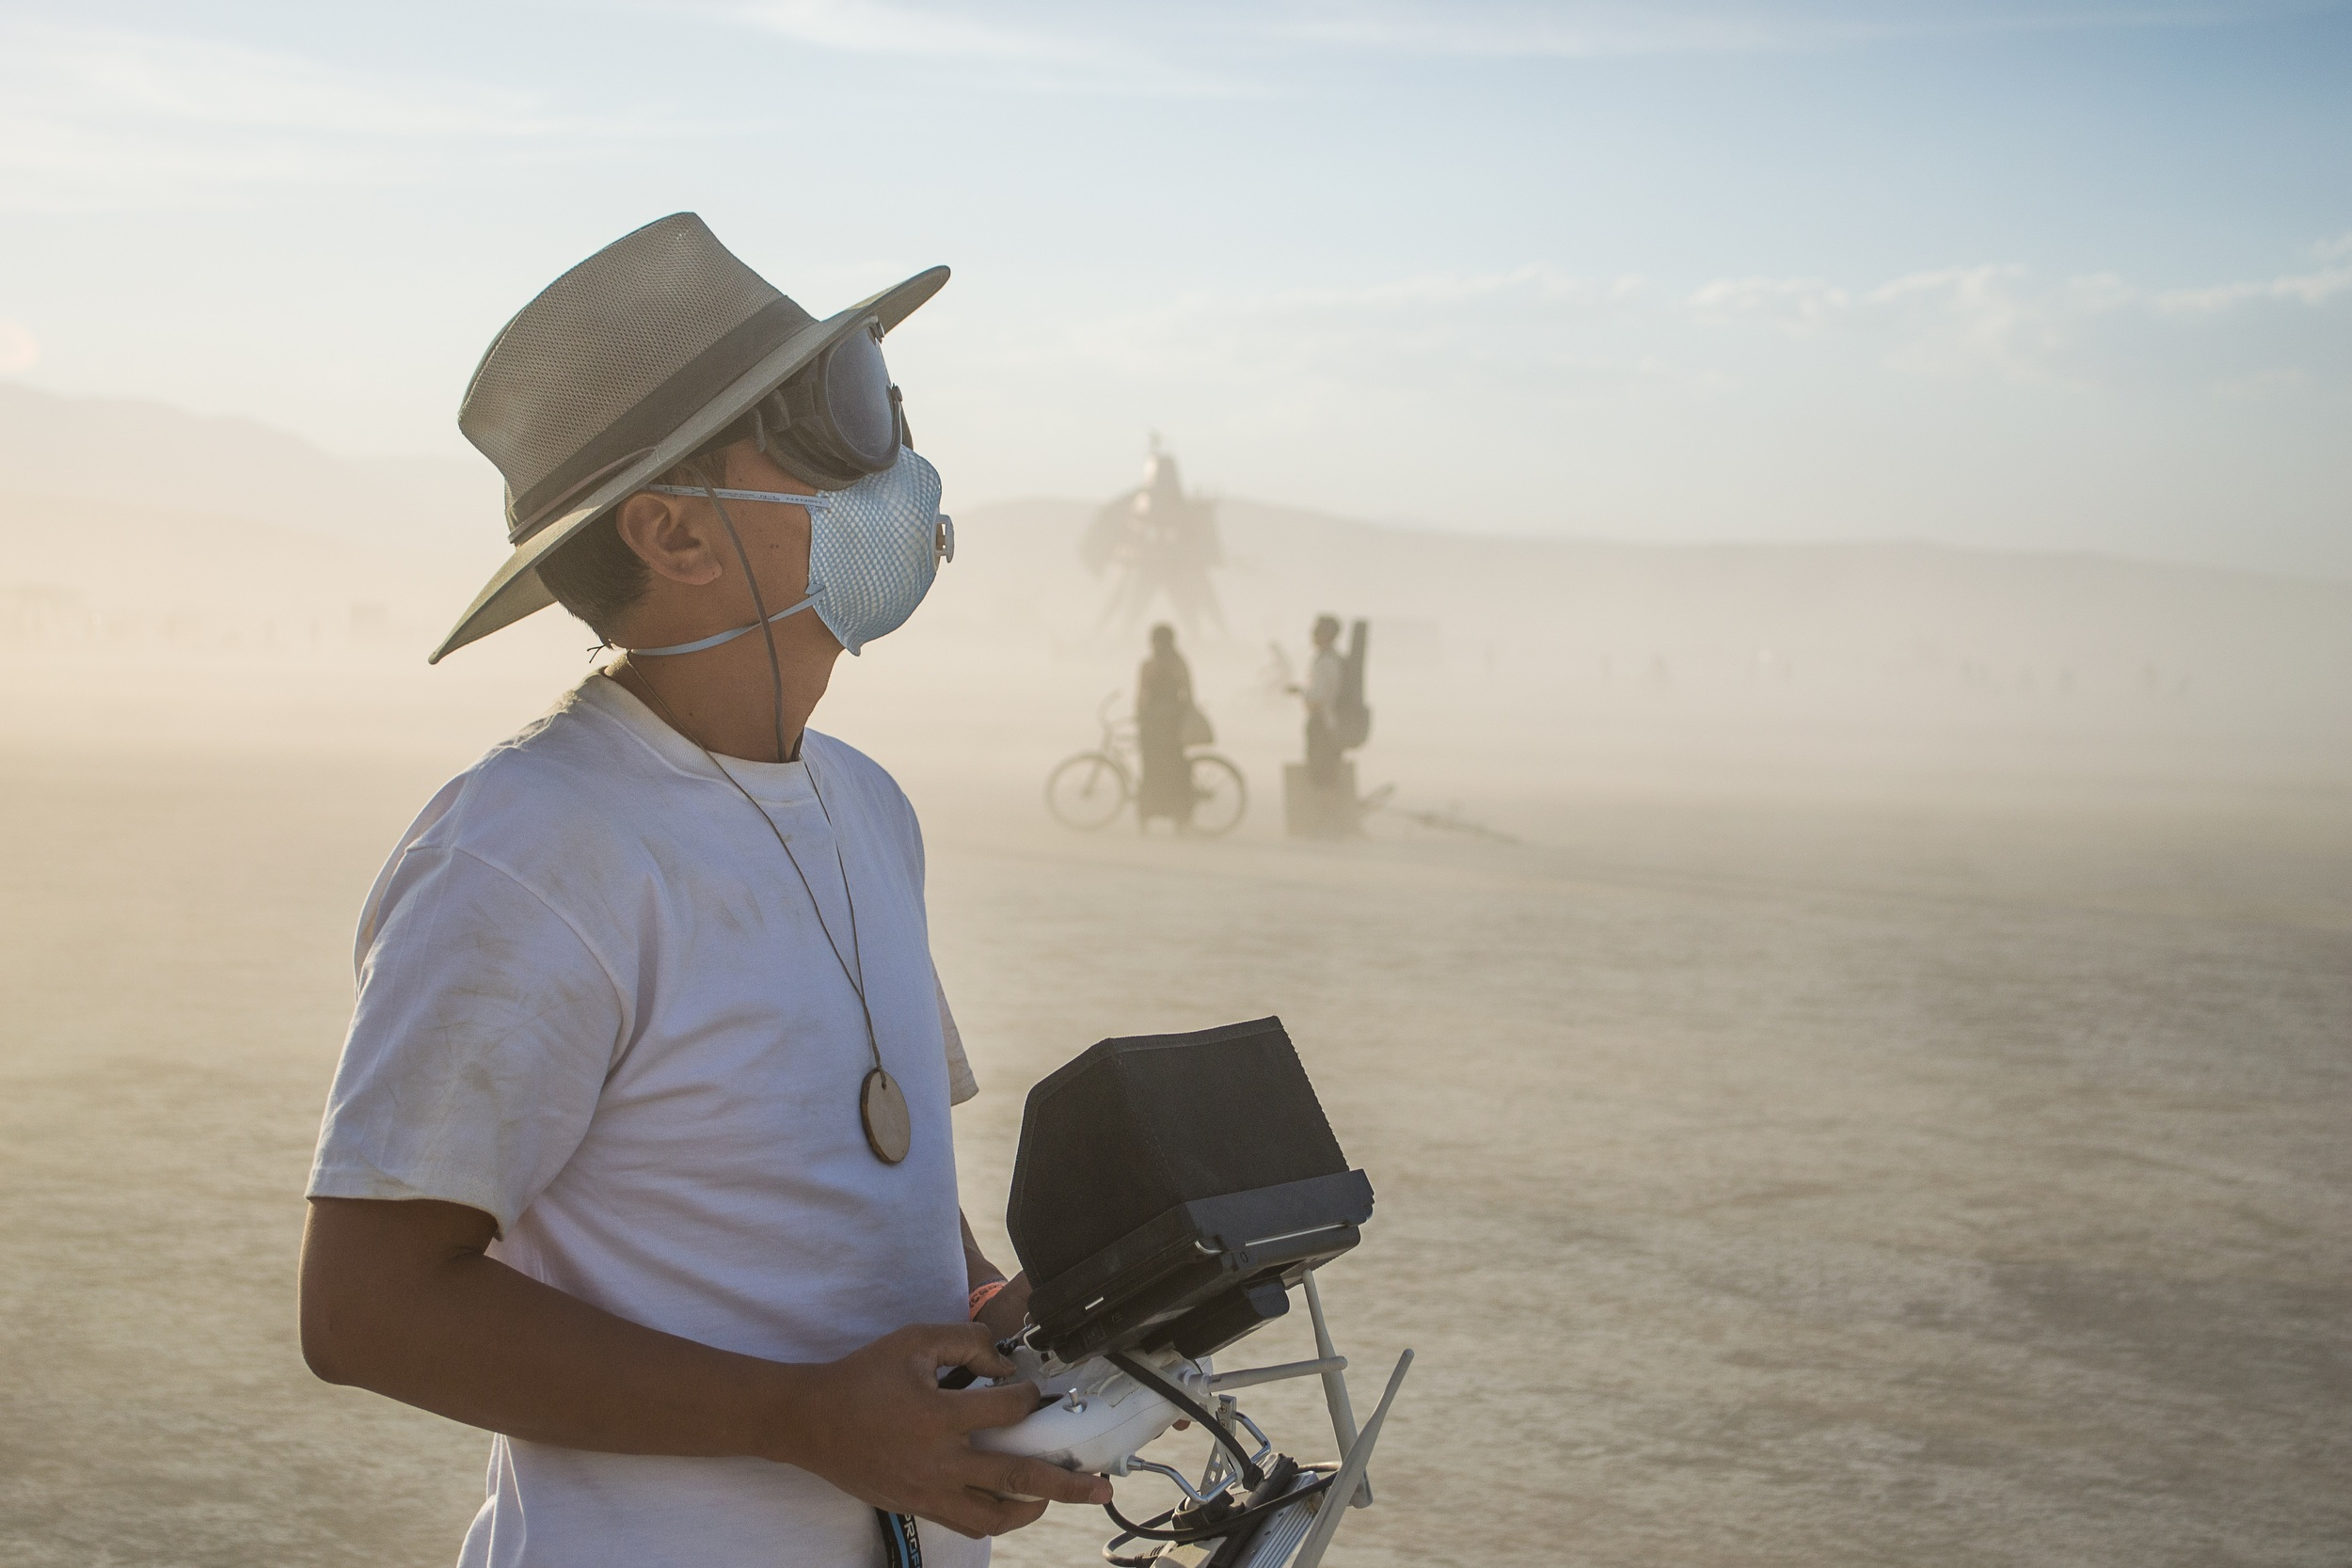 Eric Cheng flies a DJI Phantom 2 out on the playa (photo: Gerard Mattimoe)